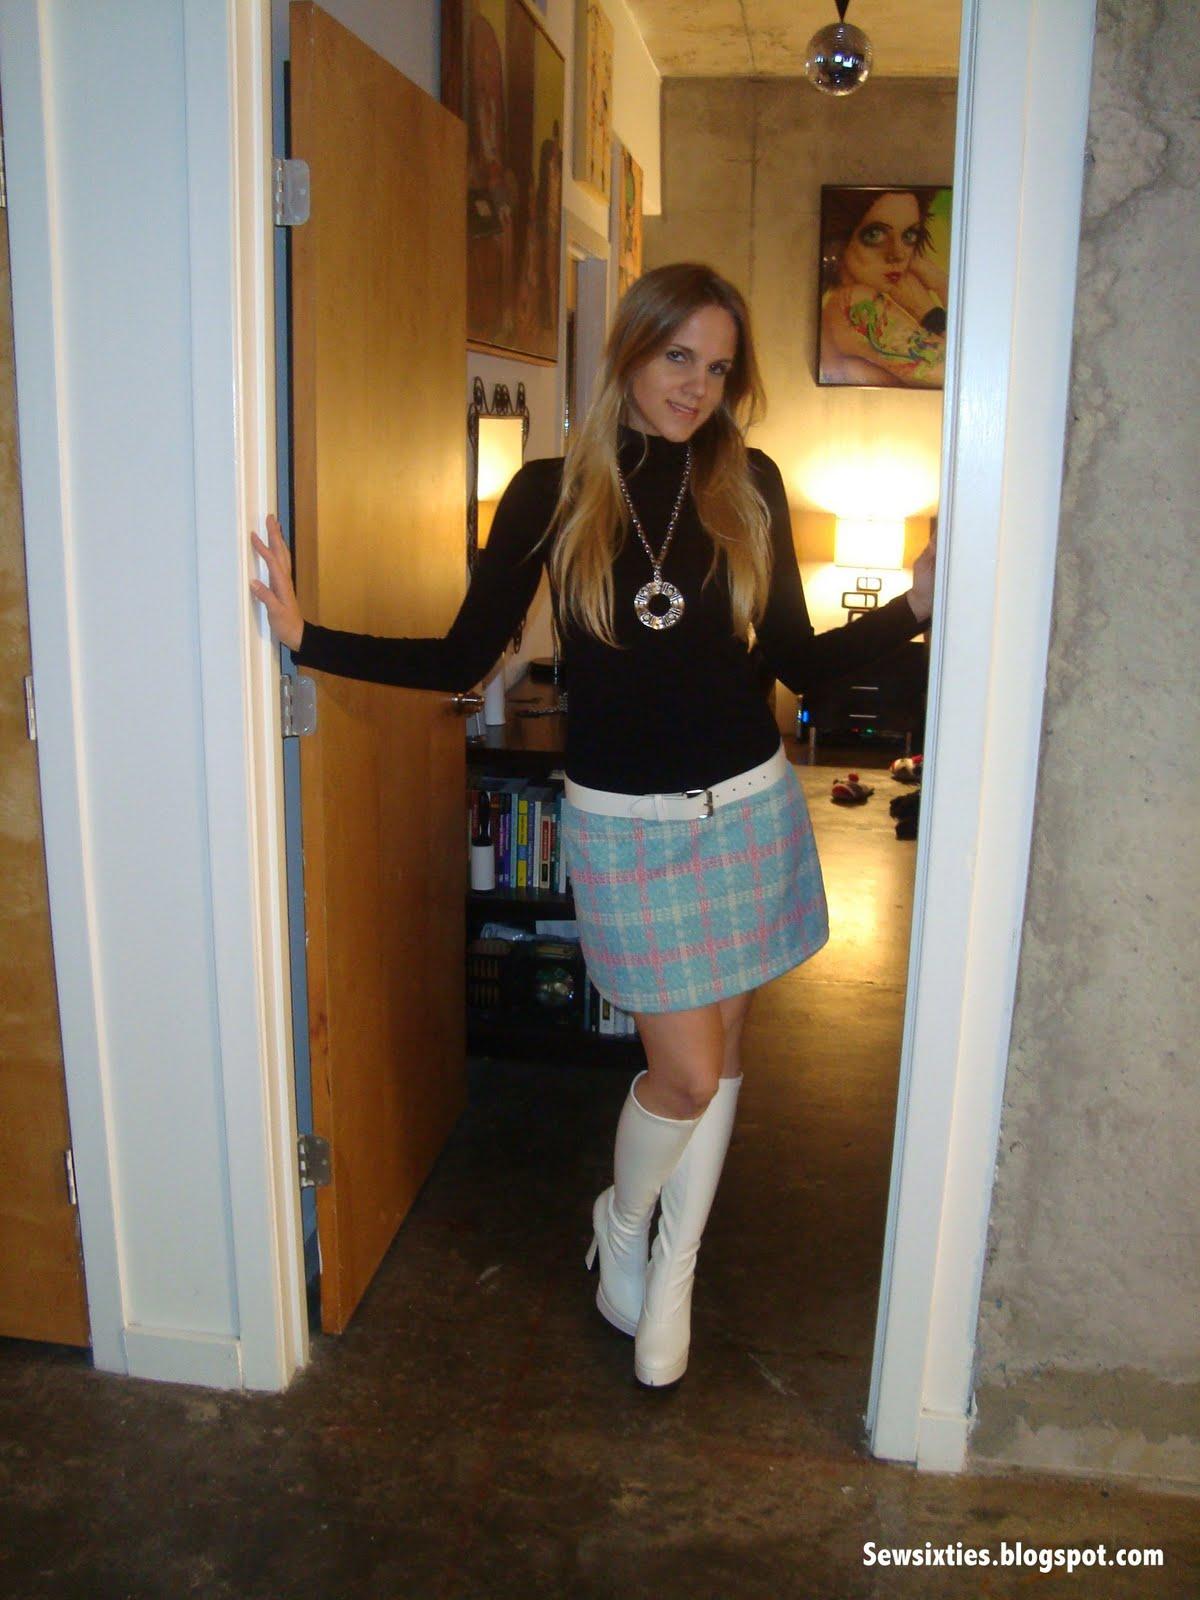 Amateur mini skirt pics